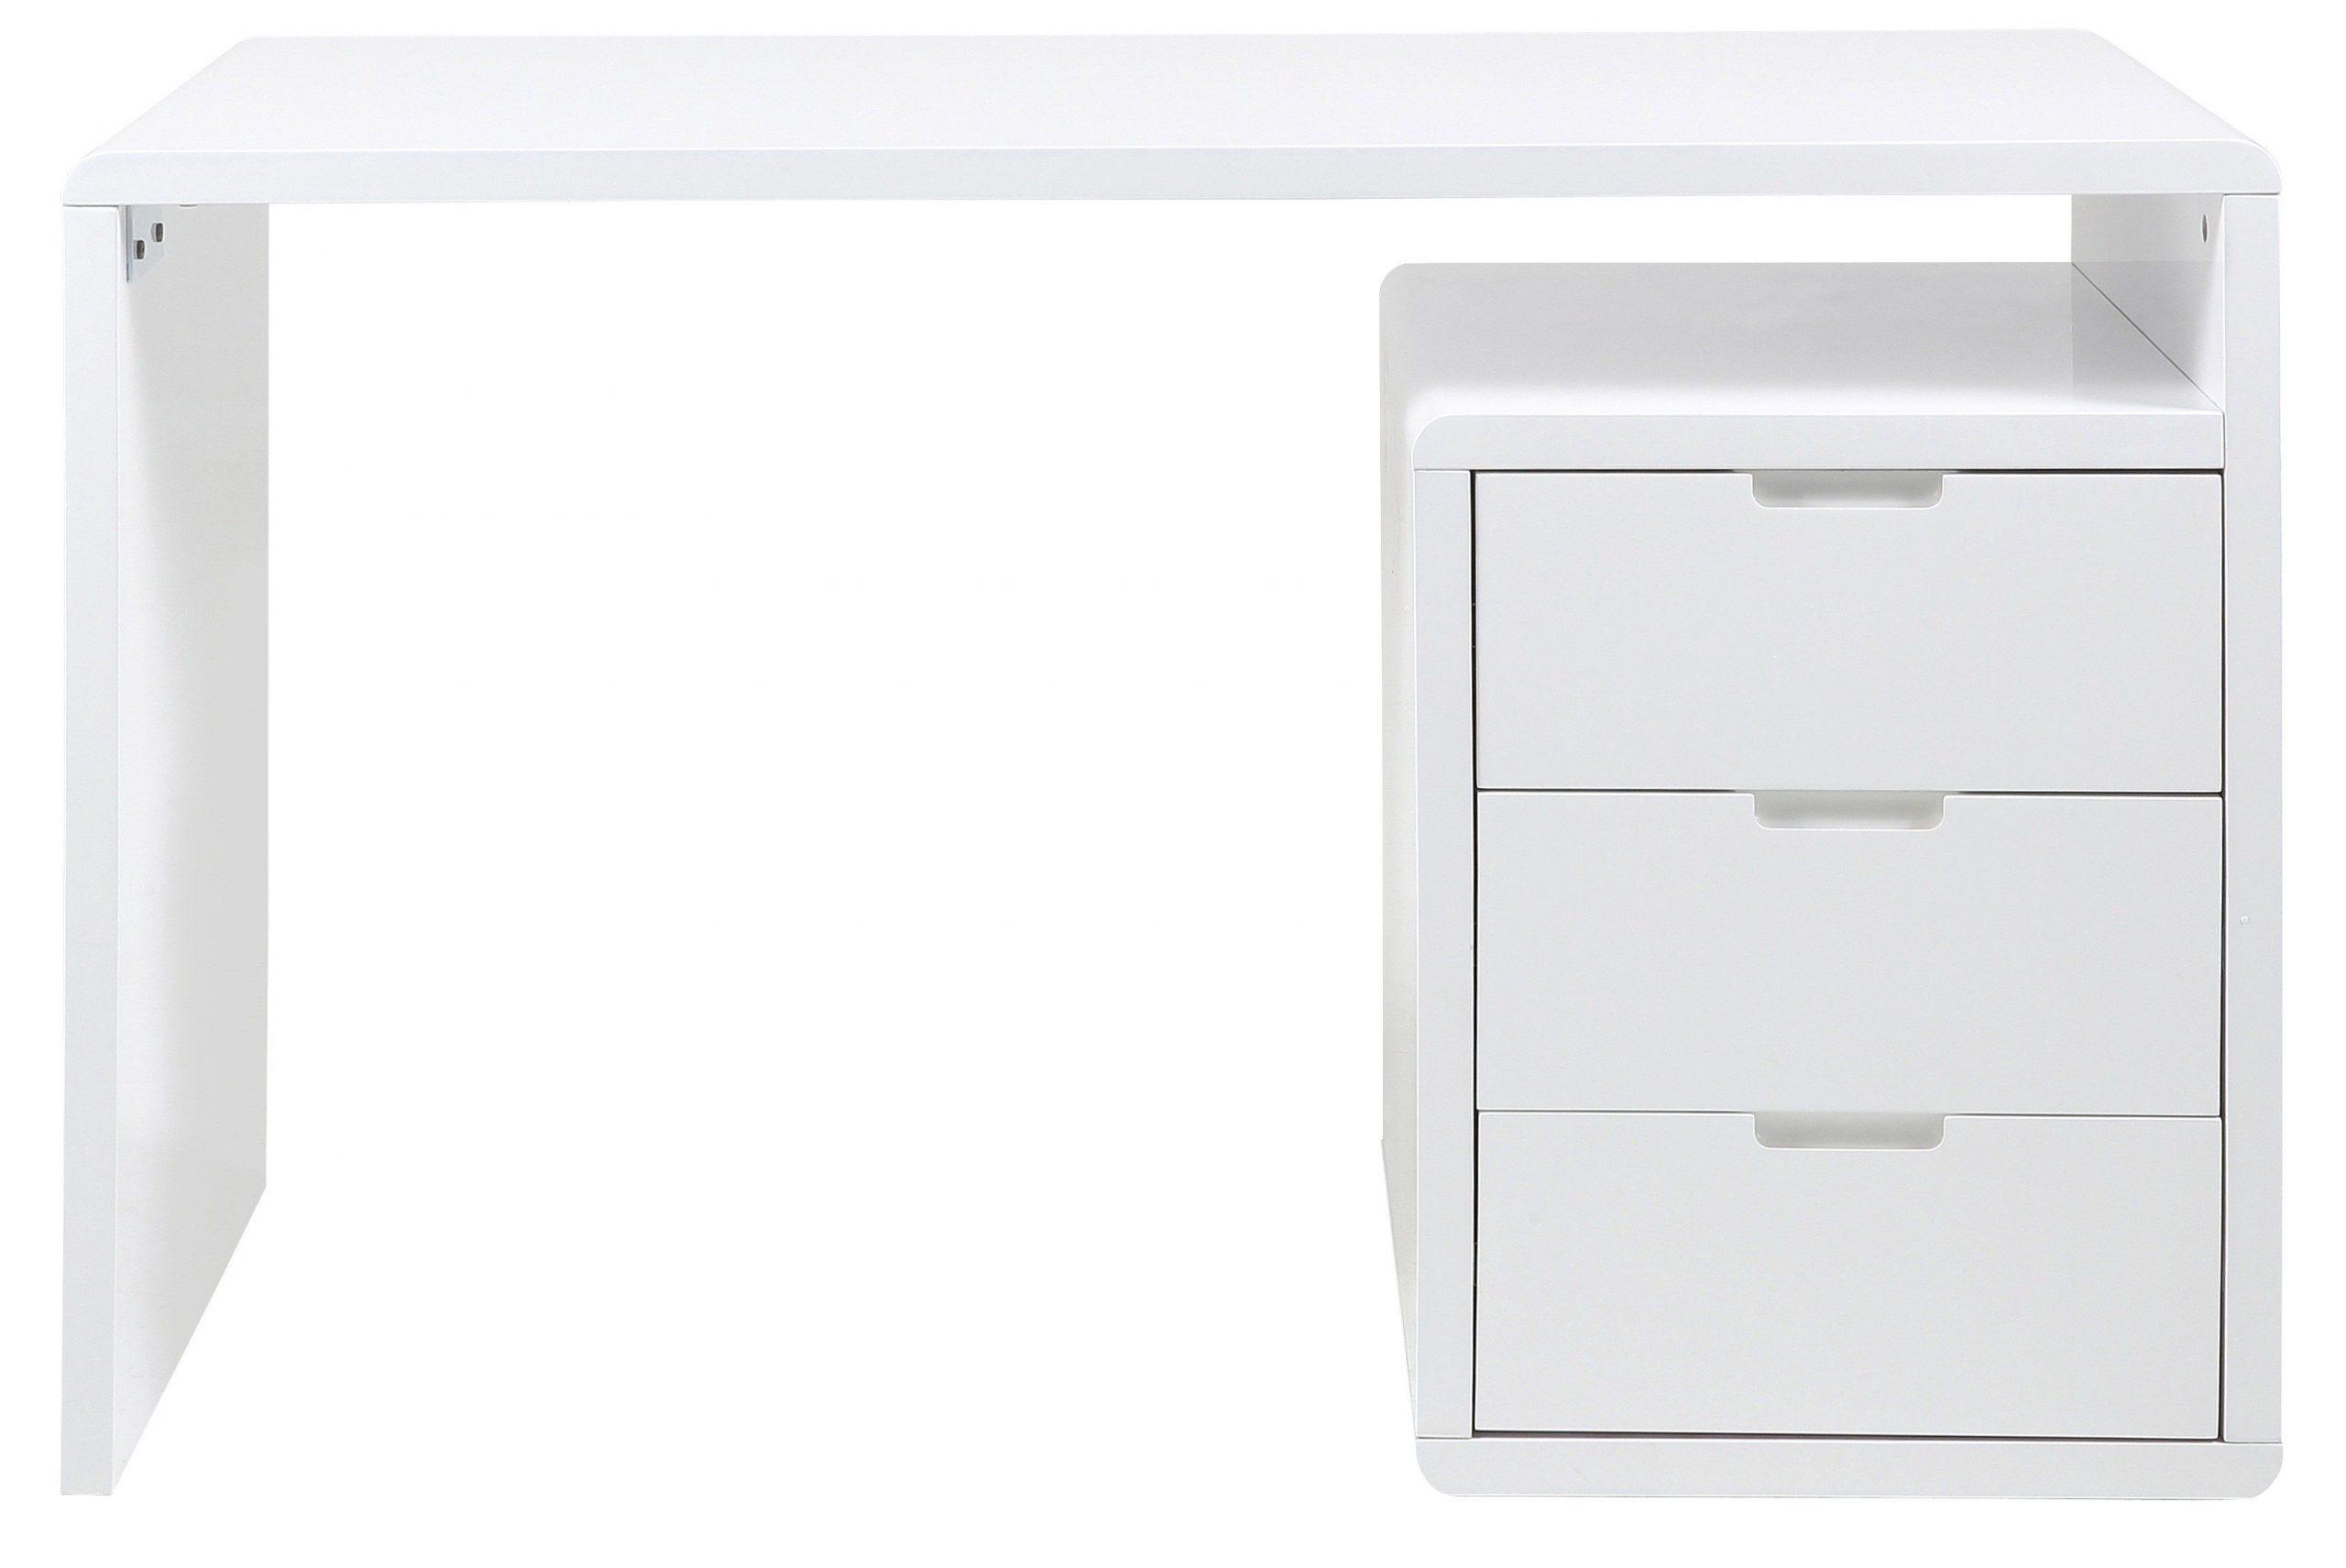 Pin Di Meuble Interieur Commode Blanc Laque Fly Agencecormierdelauniere Com